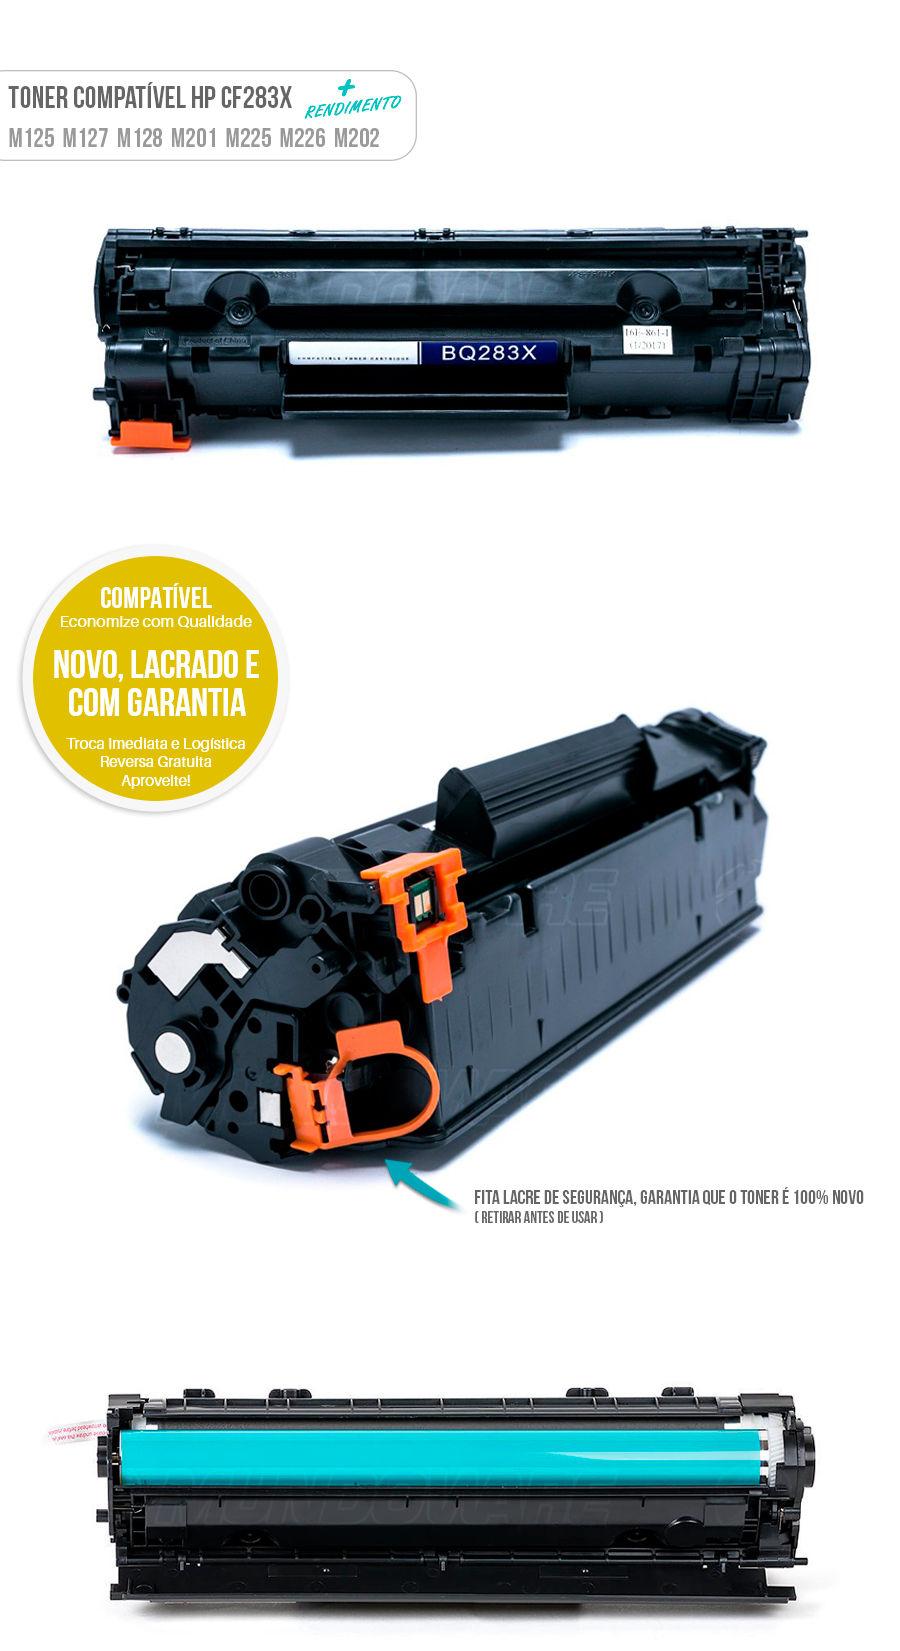 M125 M127FN M127FW M127 M125 M201 M225 M226 M202 M201DW Tonner HP maior rendimento 83X